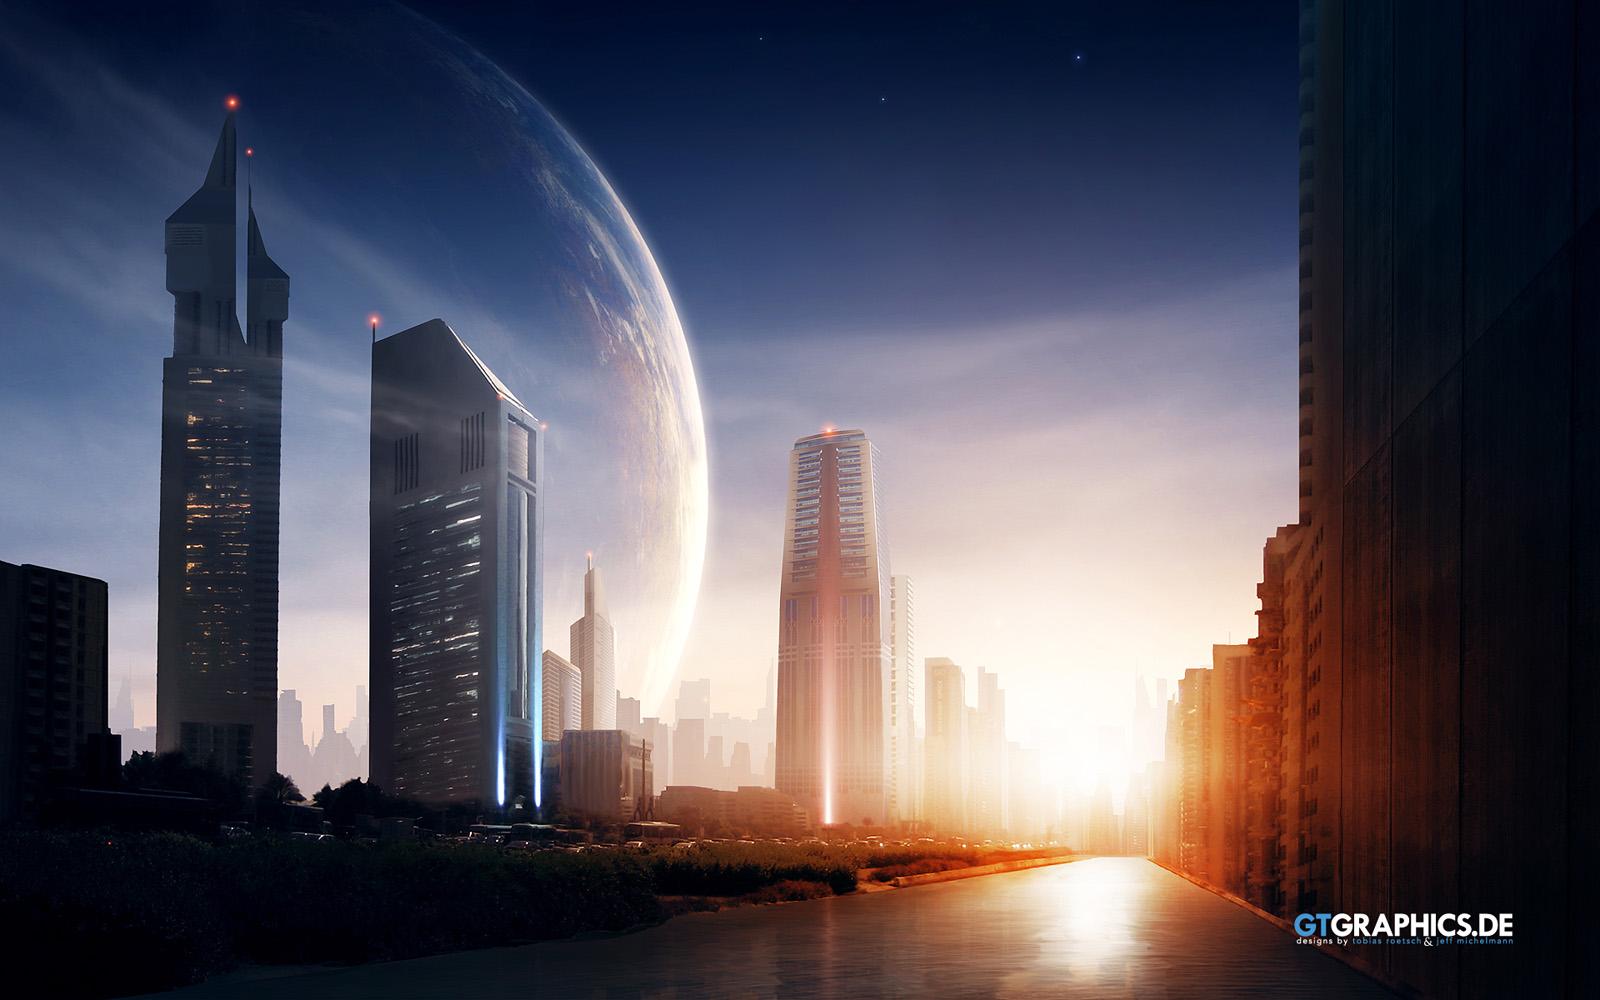 Future city hd wallpaper future city pictures cool 1600x1000